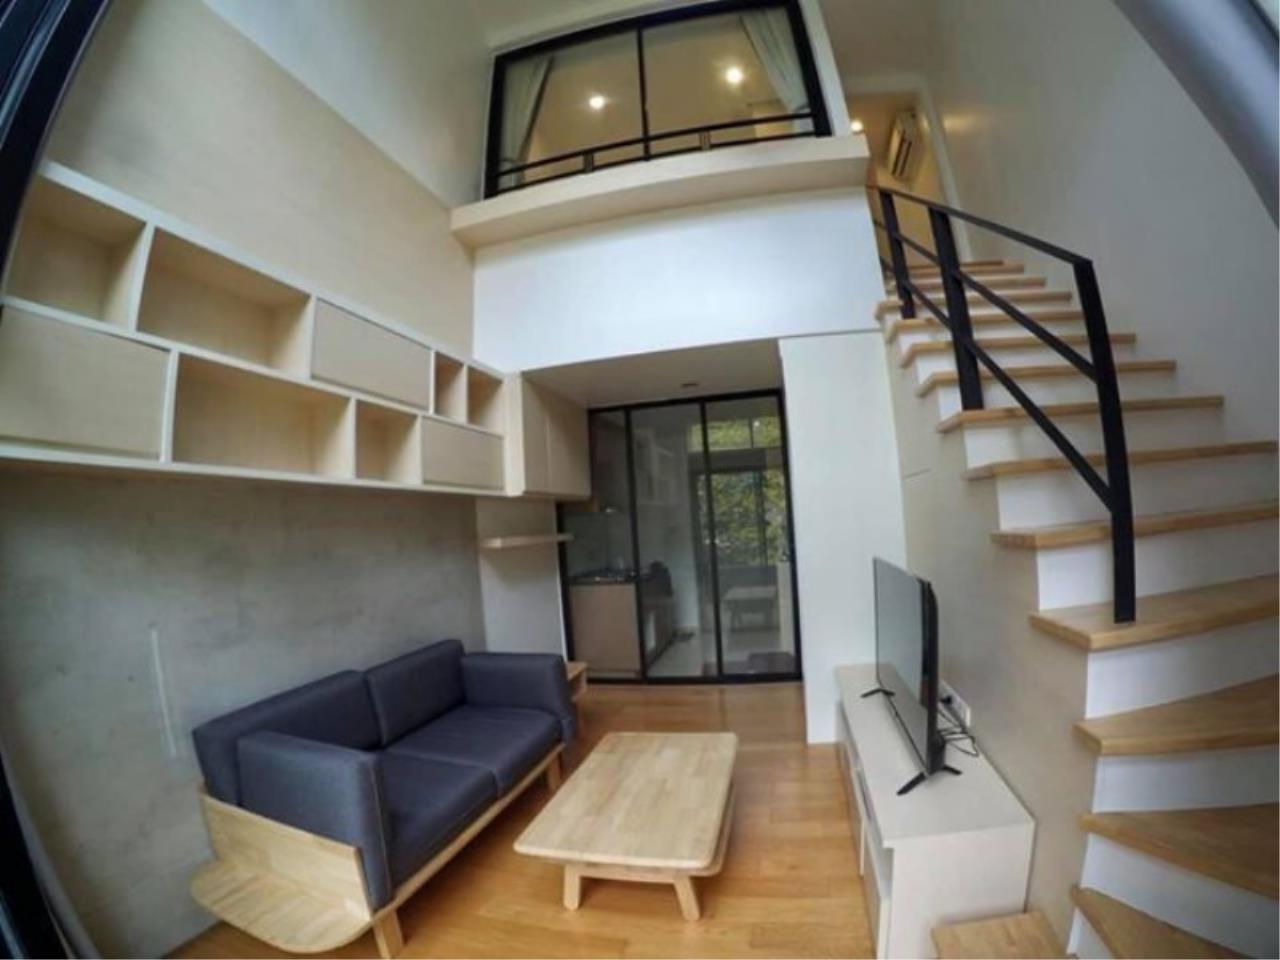 Century21 Skylux Agency's L Loft Ratchada 19 / Condo For Sale / 1 Bedroom / 41 SQM / MRT Ratchadaphisek / Bangkok 2